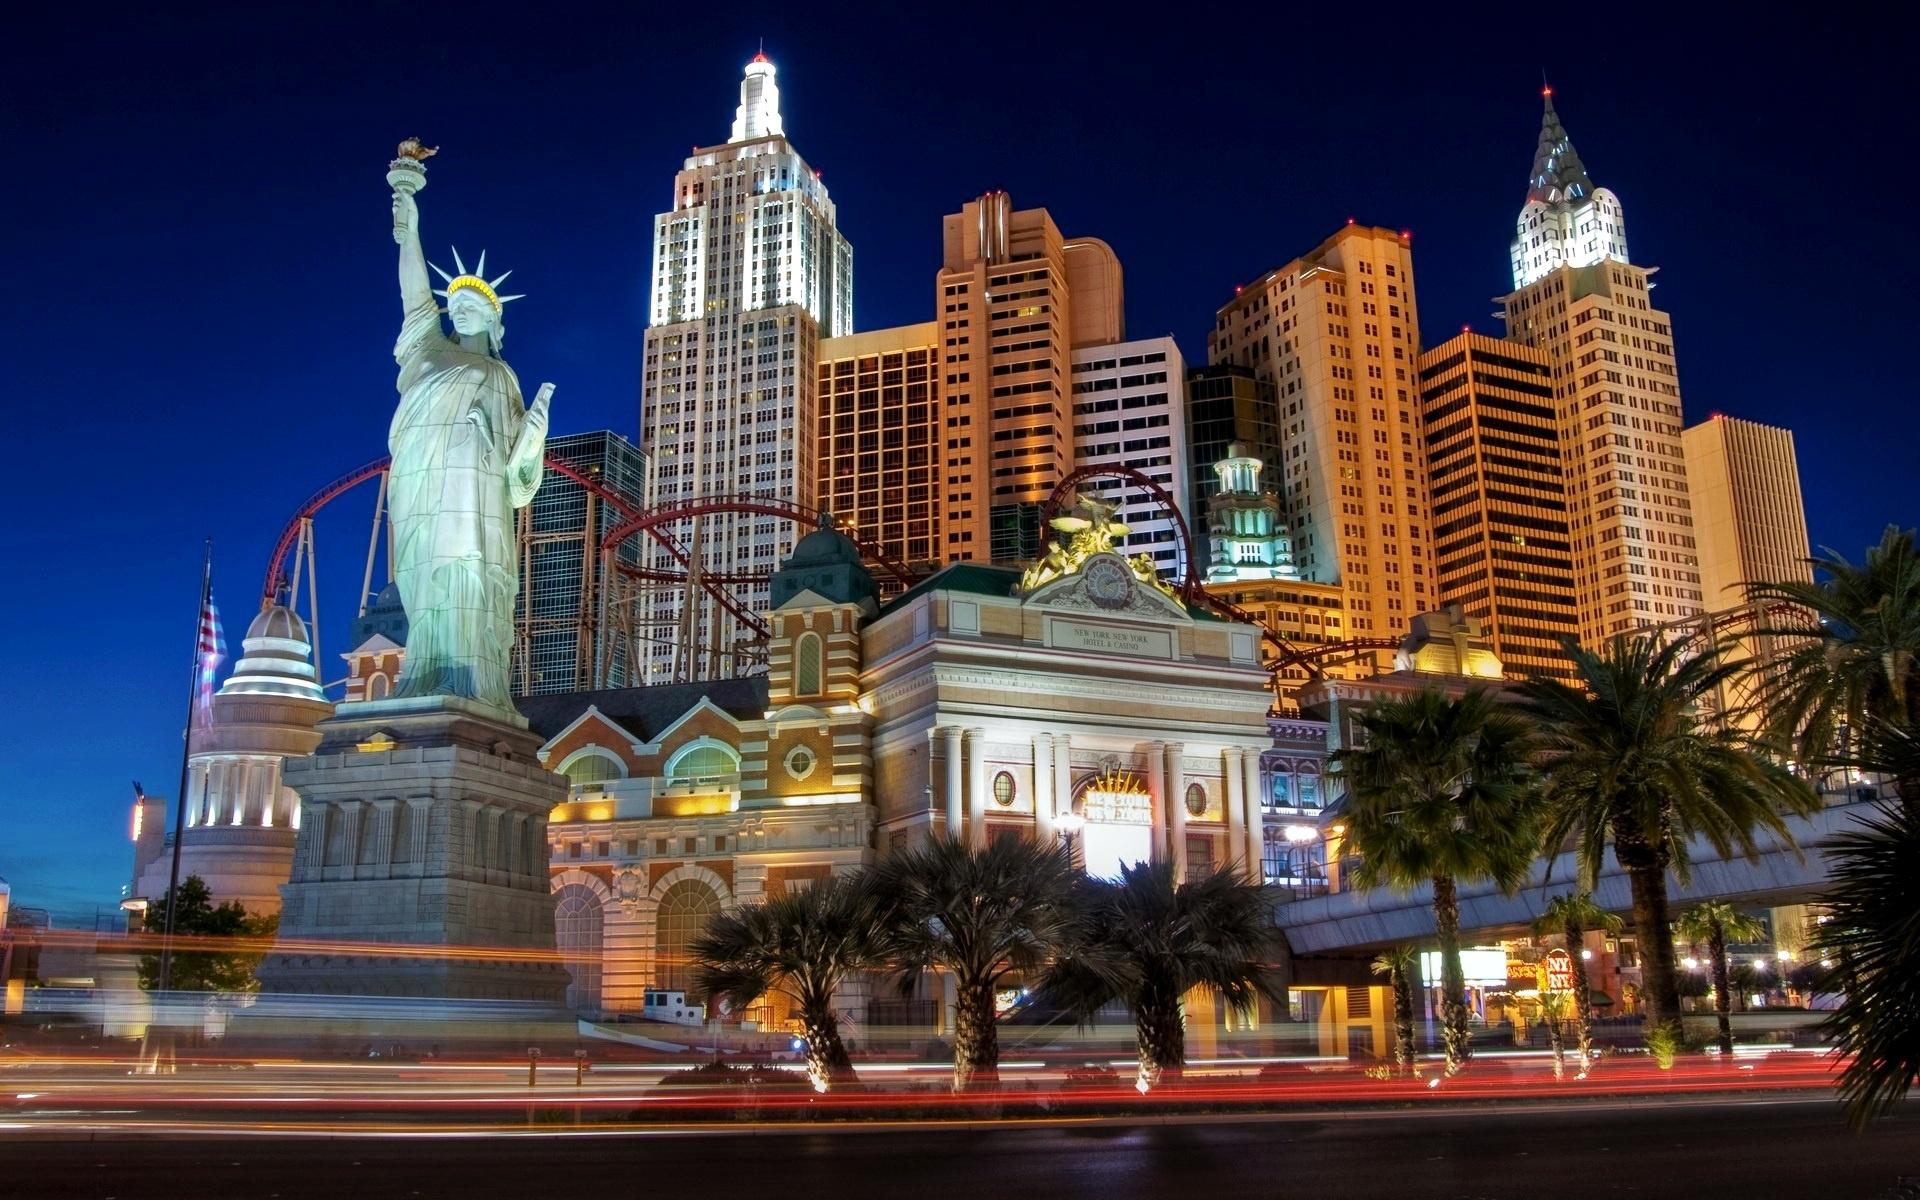 New York New York Hotel Casino Wallpapers HD Wallpapers 1920x1200